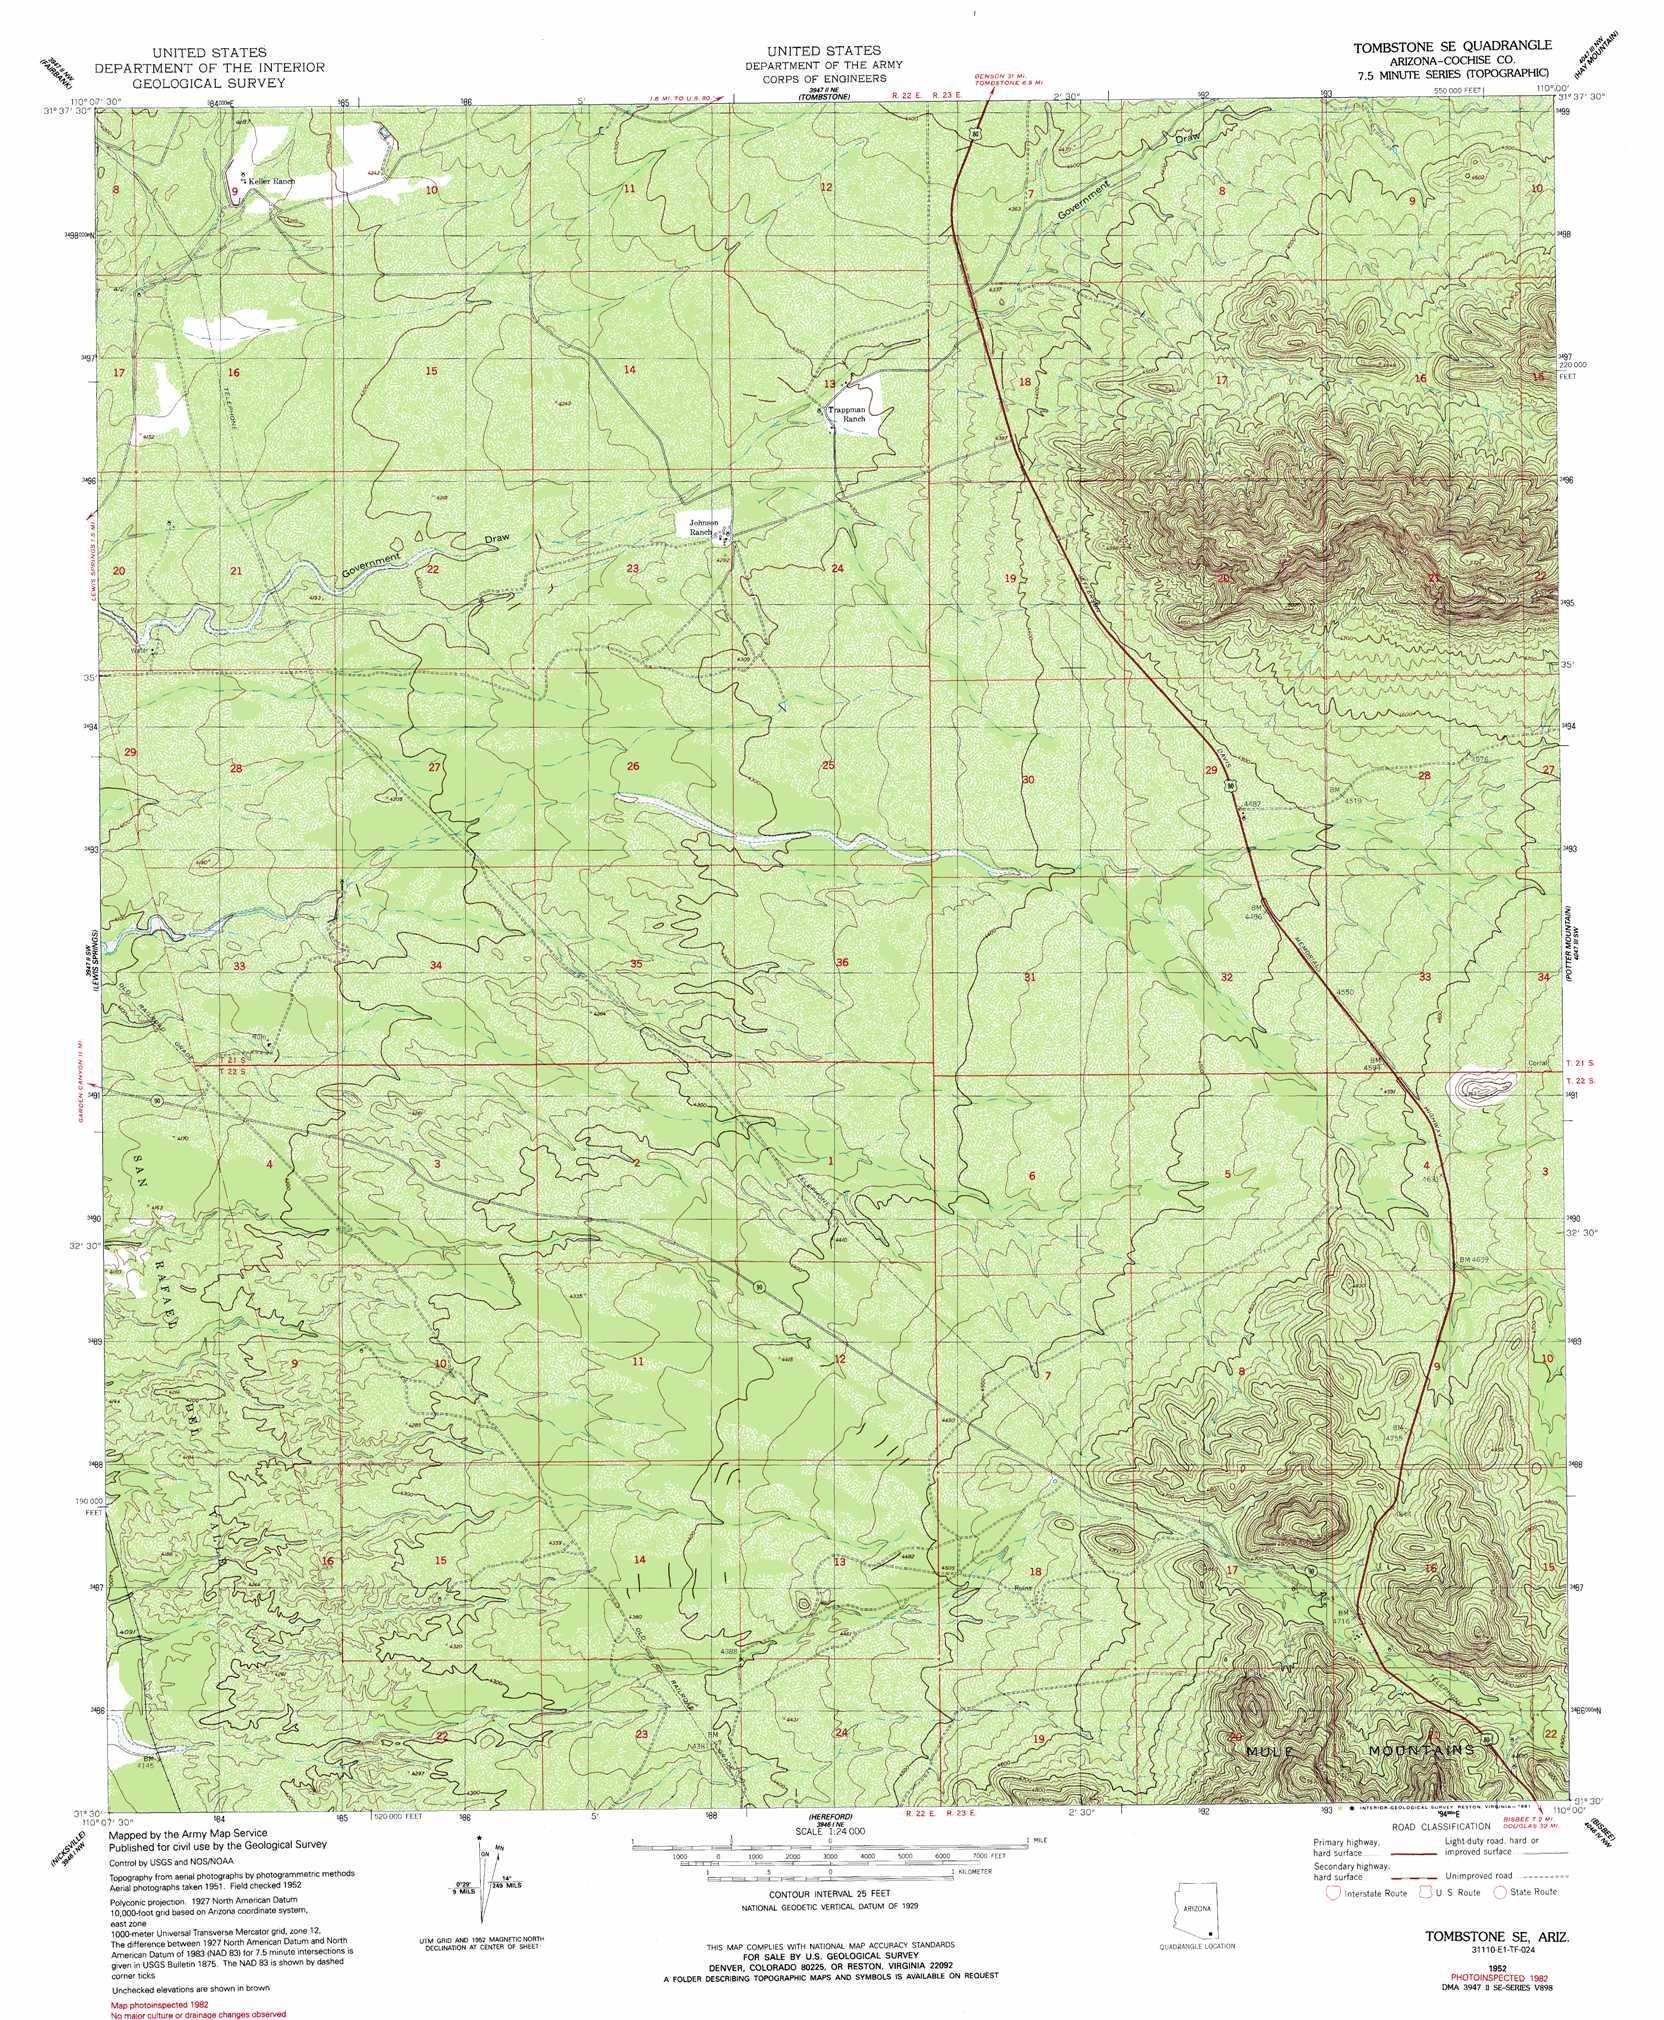 Show Map Of Arizona.Tombstone Se Topographic Map Az Usgs Topo Quad 31110e1